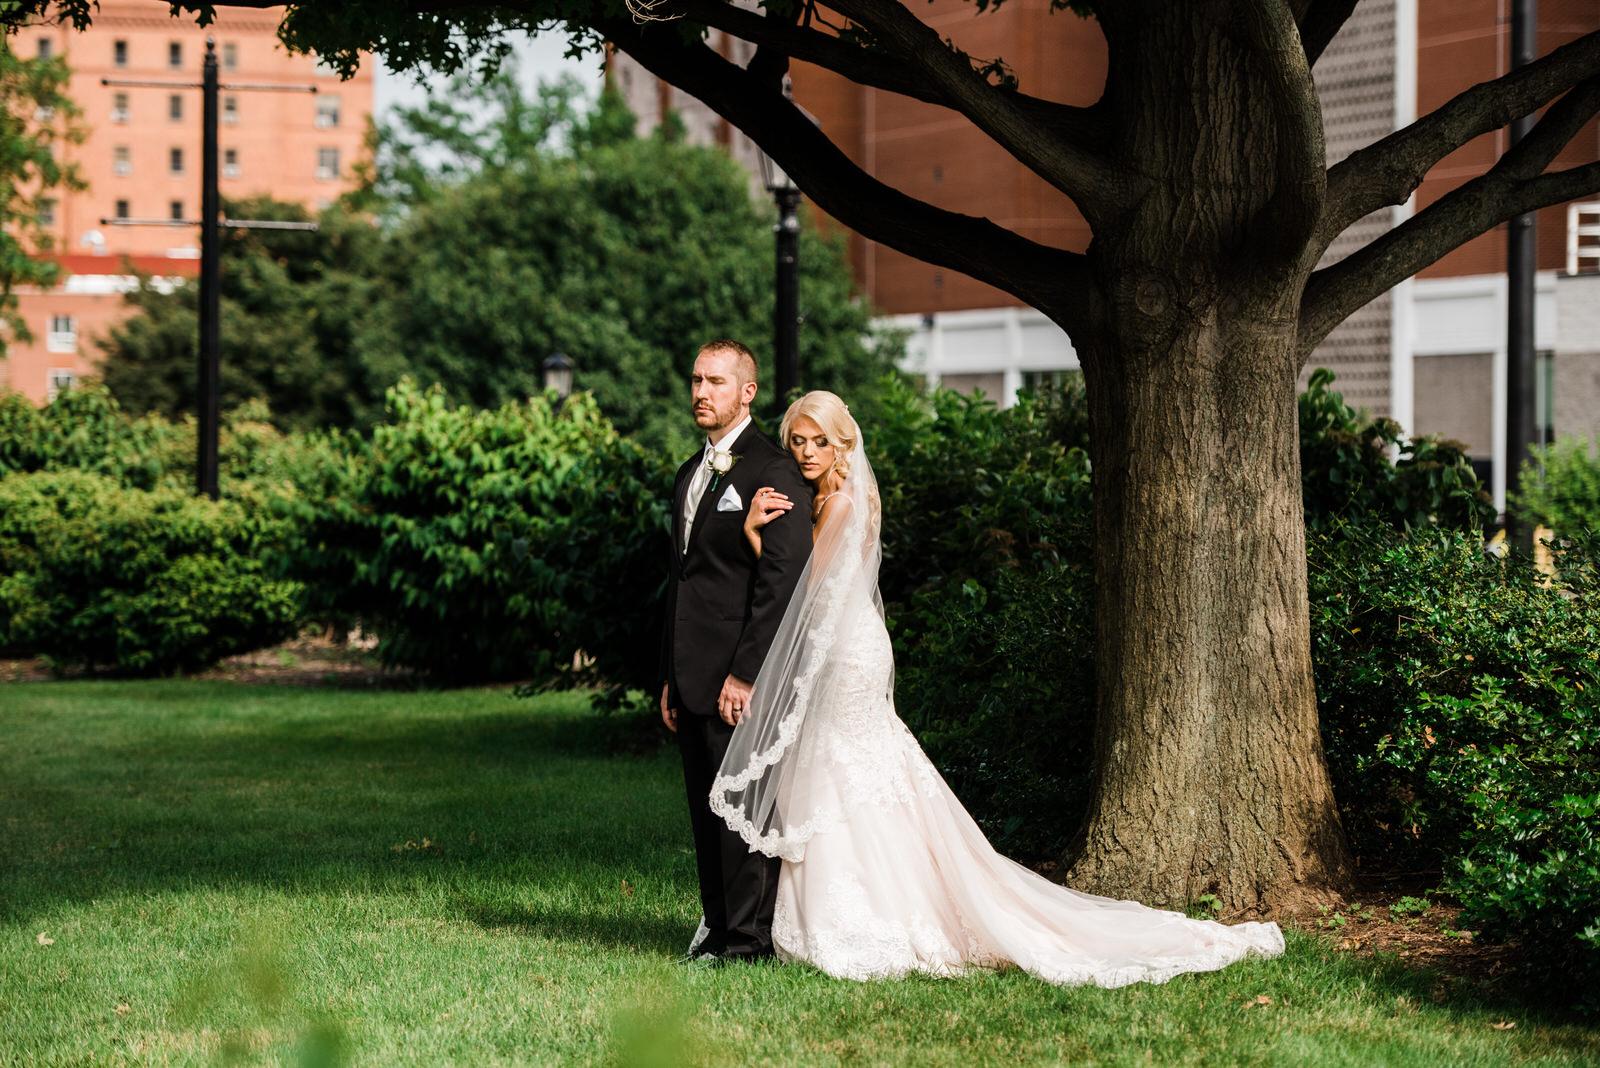 posed image on wedding day